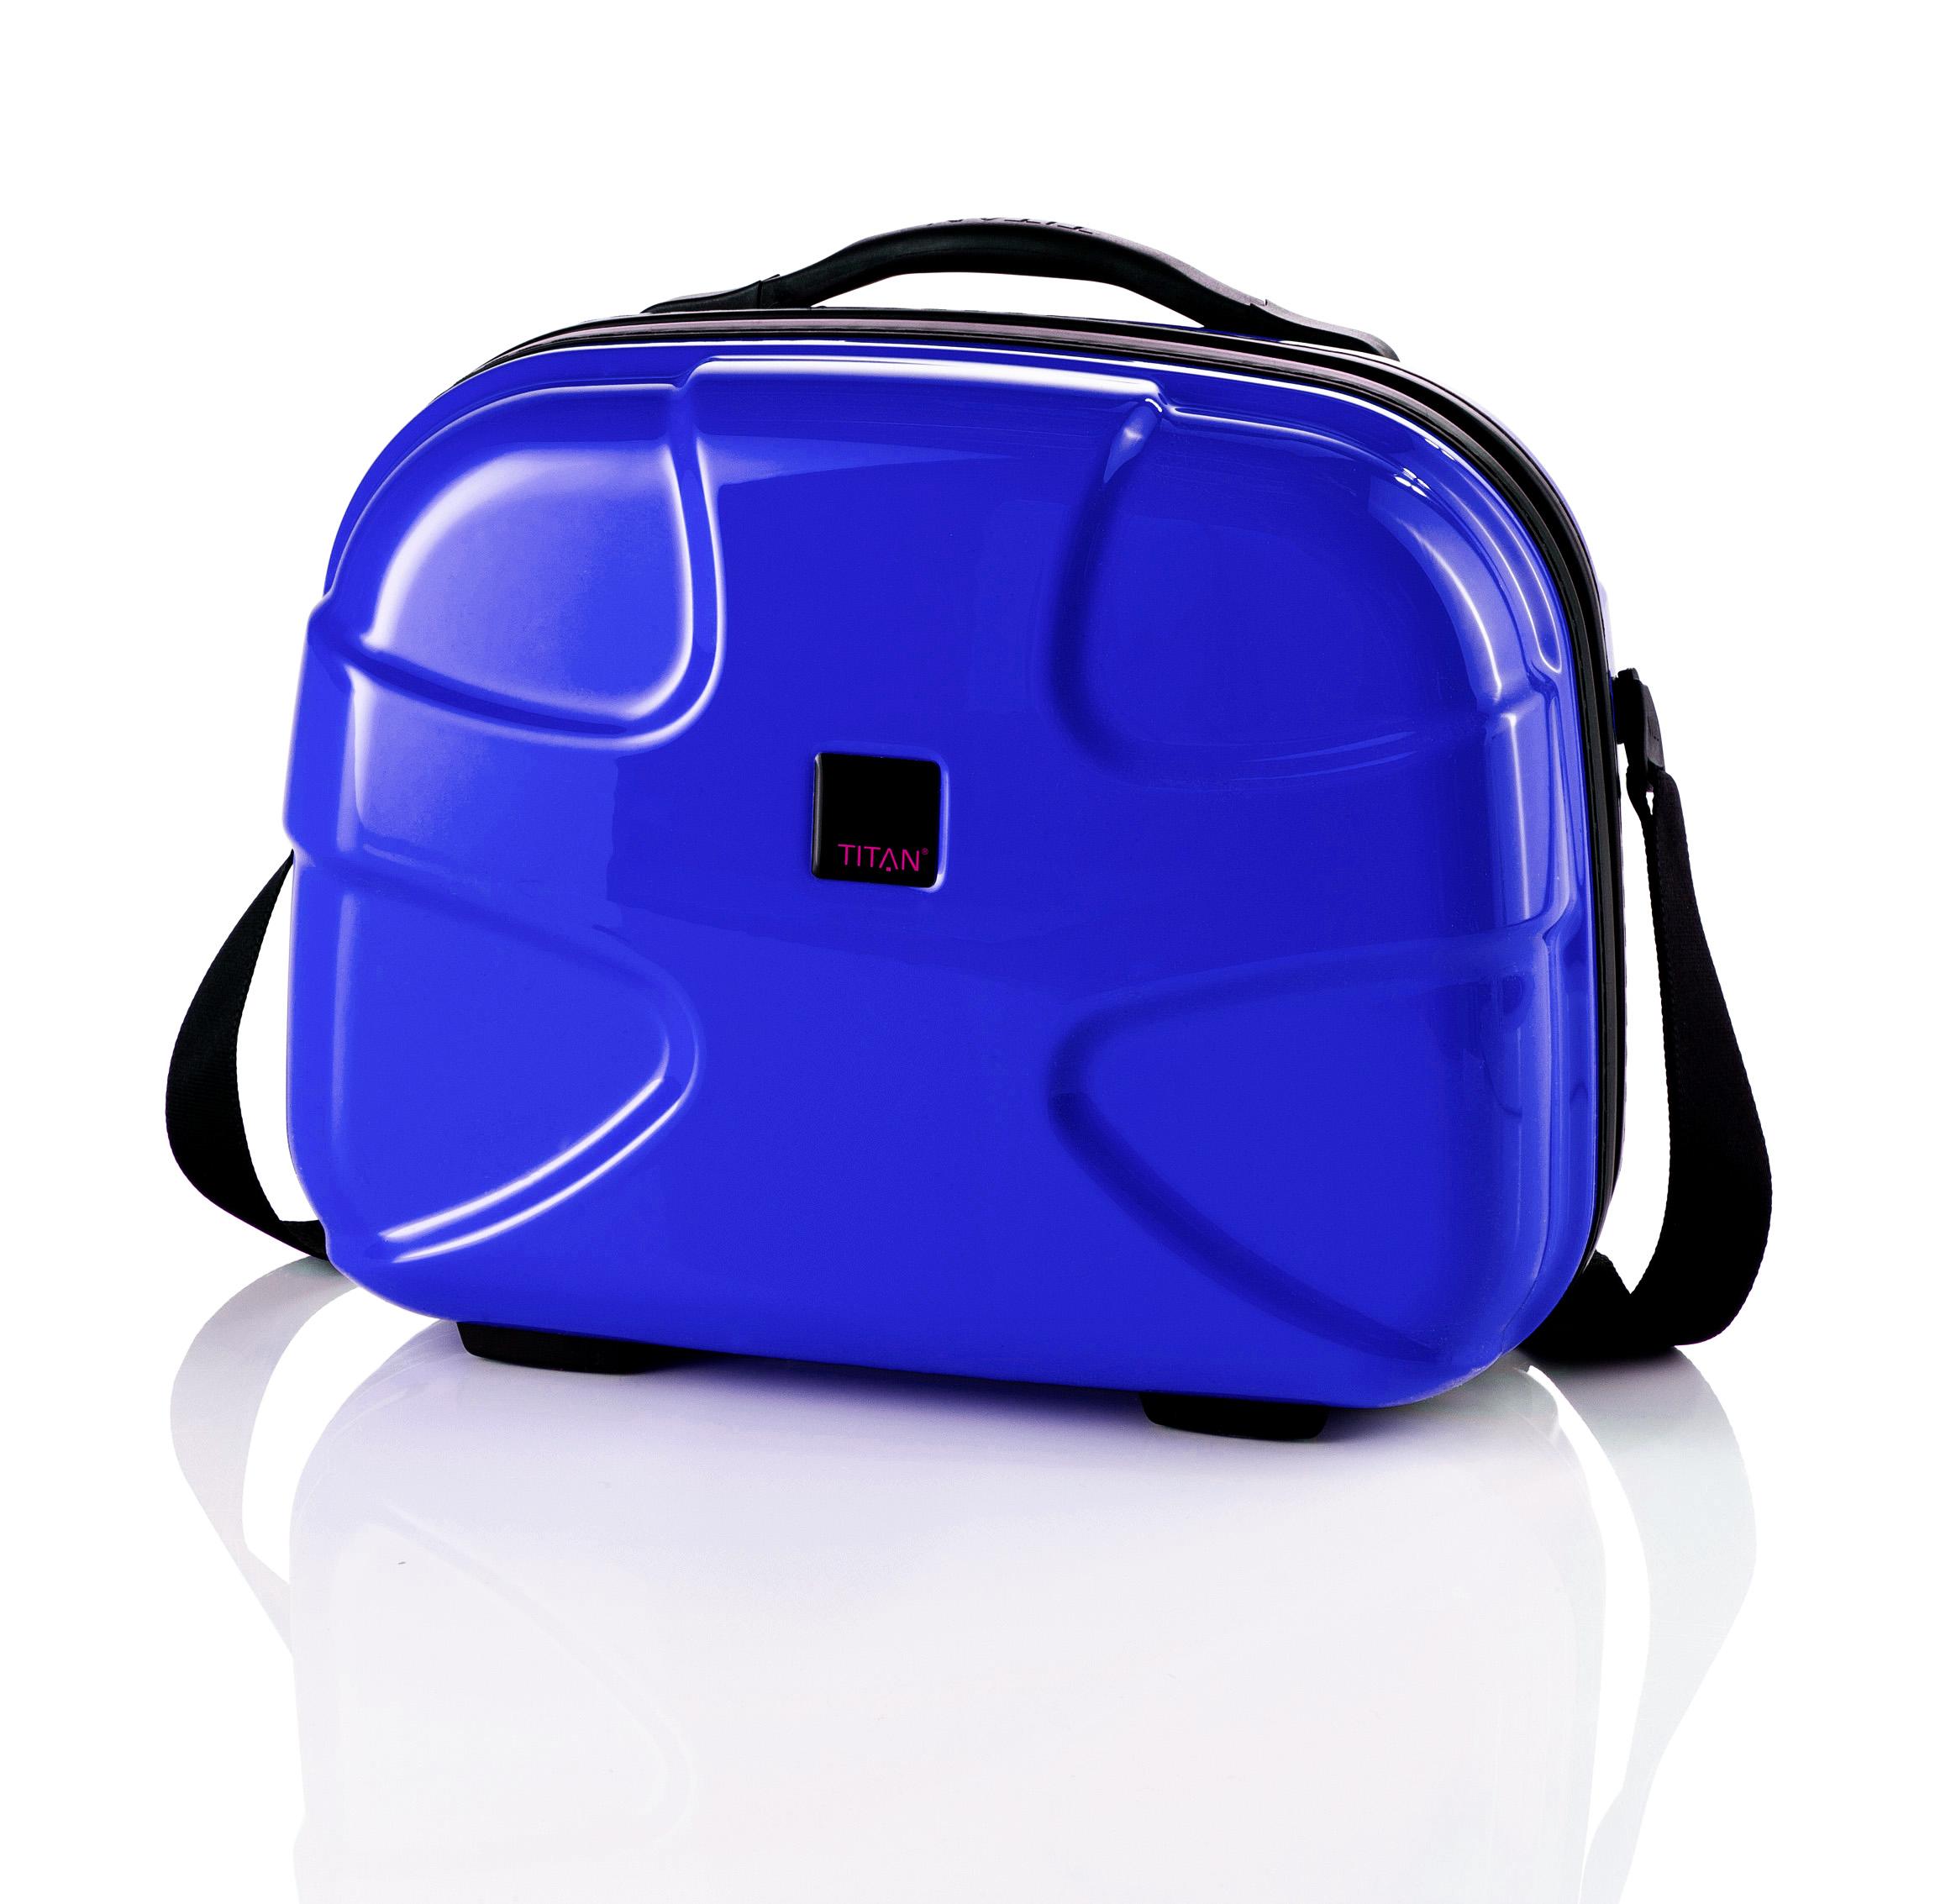 Titan X2 Beauty Case Midnight Blue